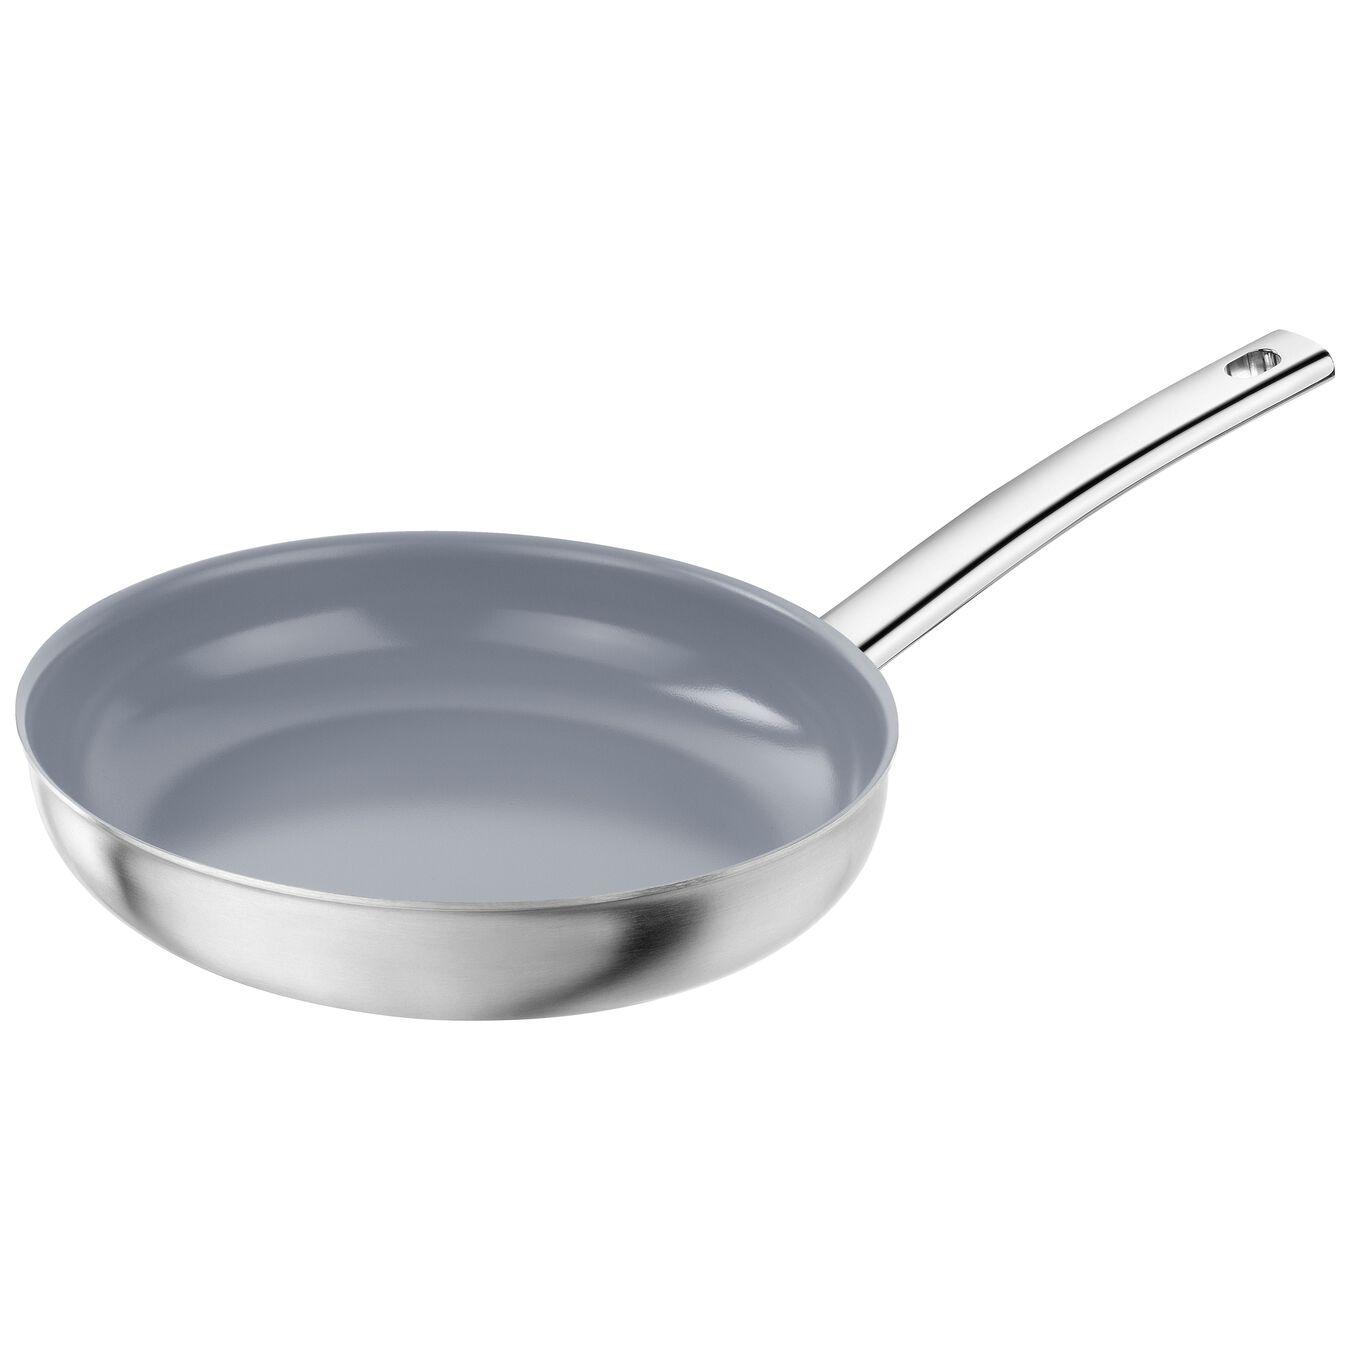 Stekpanna 24 cm, 18/10 Rostfritt stål, Silver,,large 1